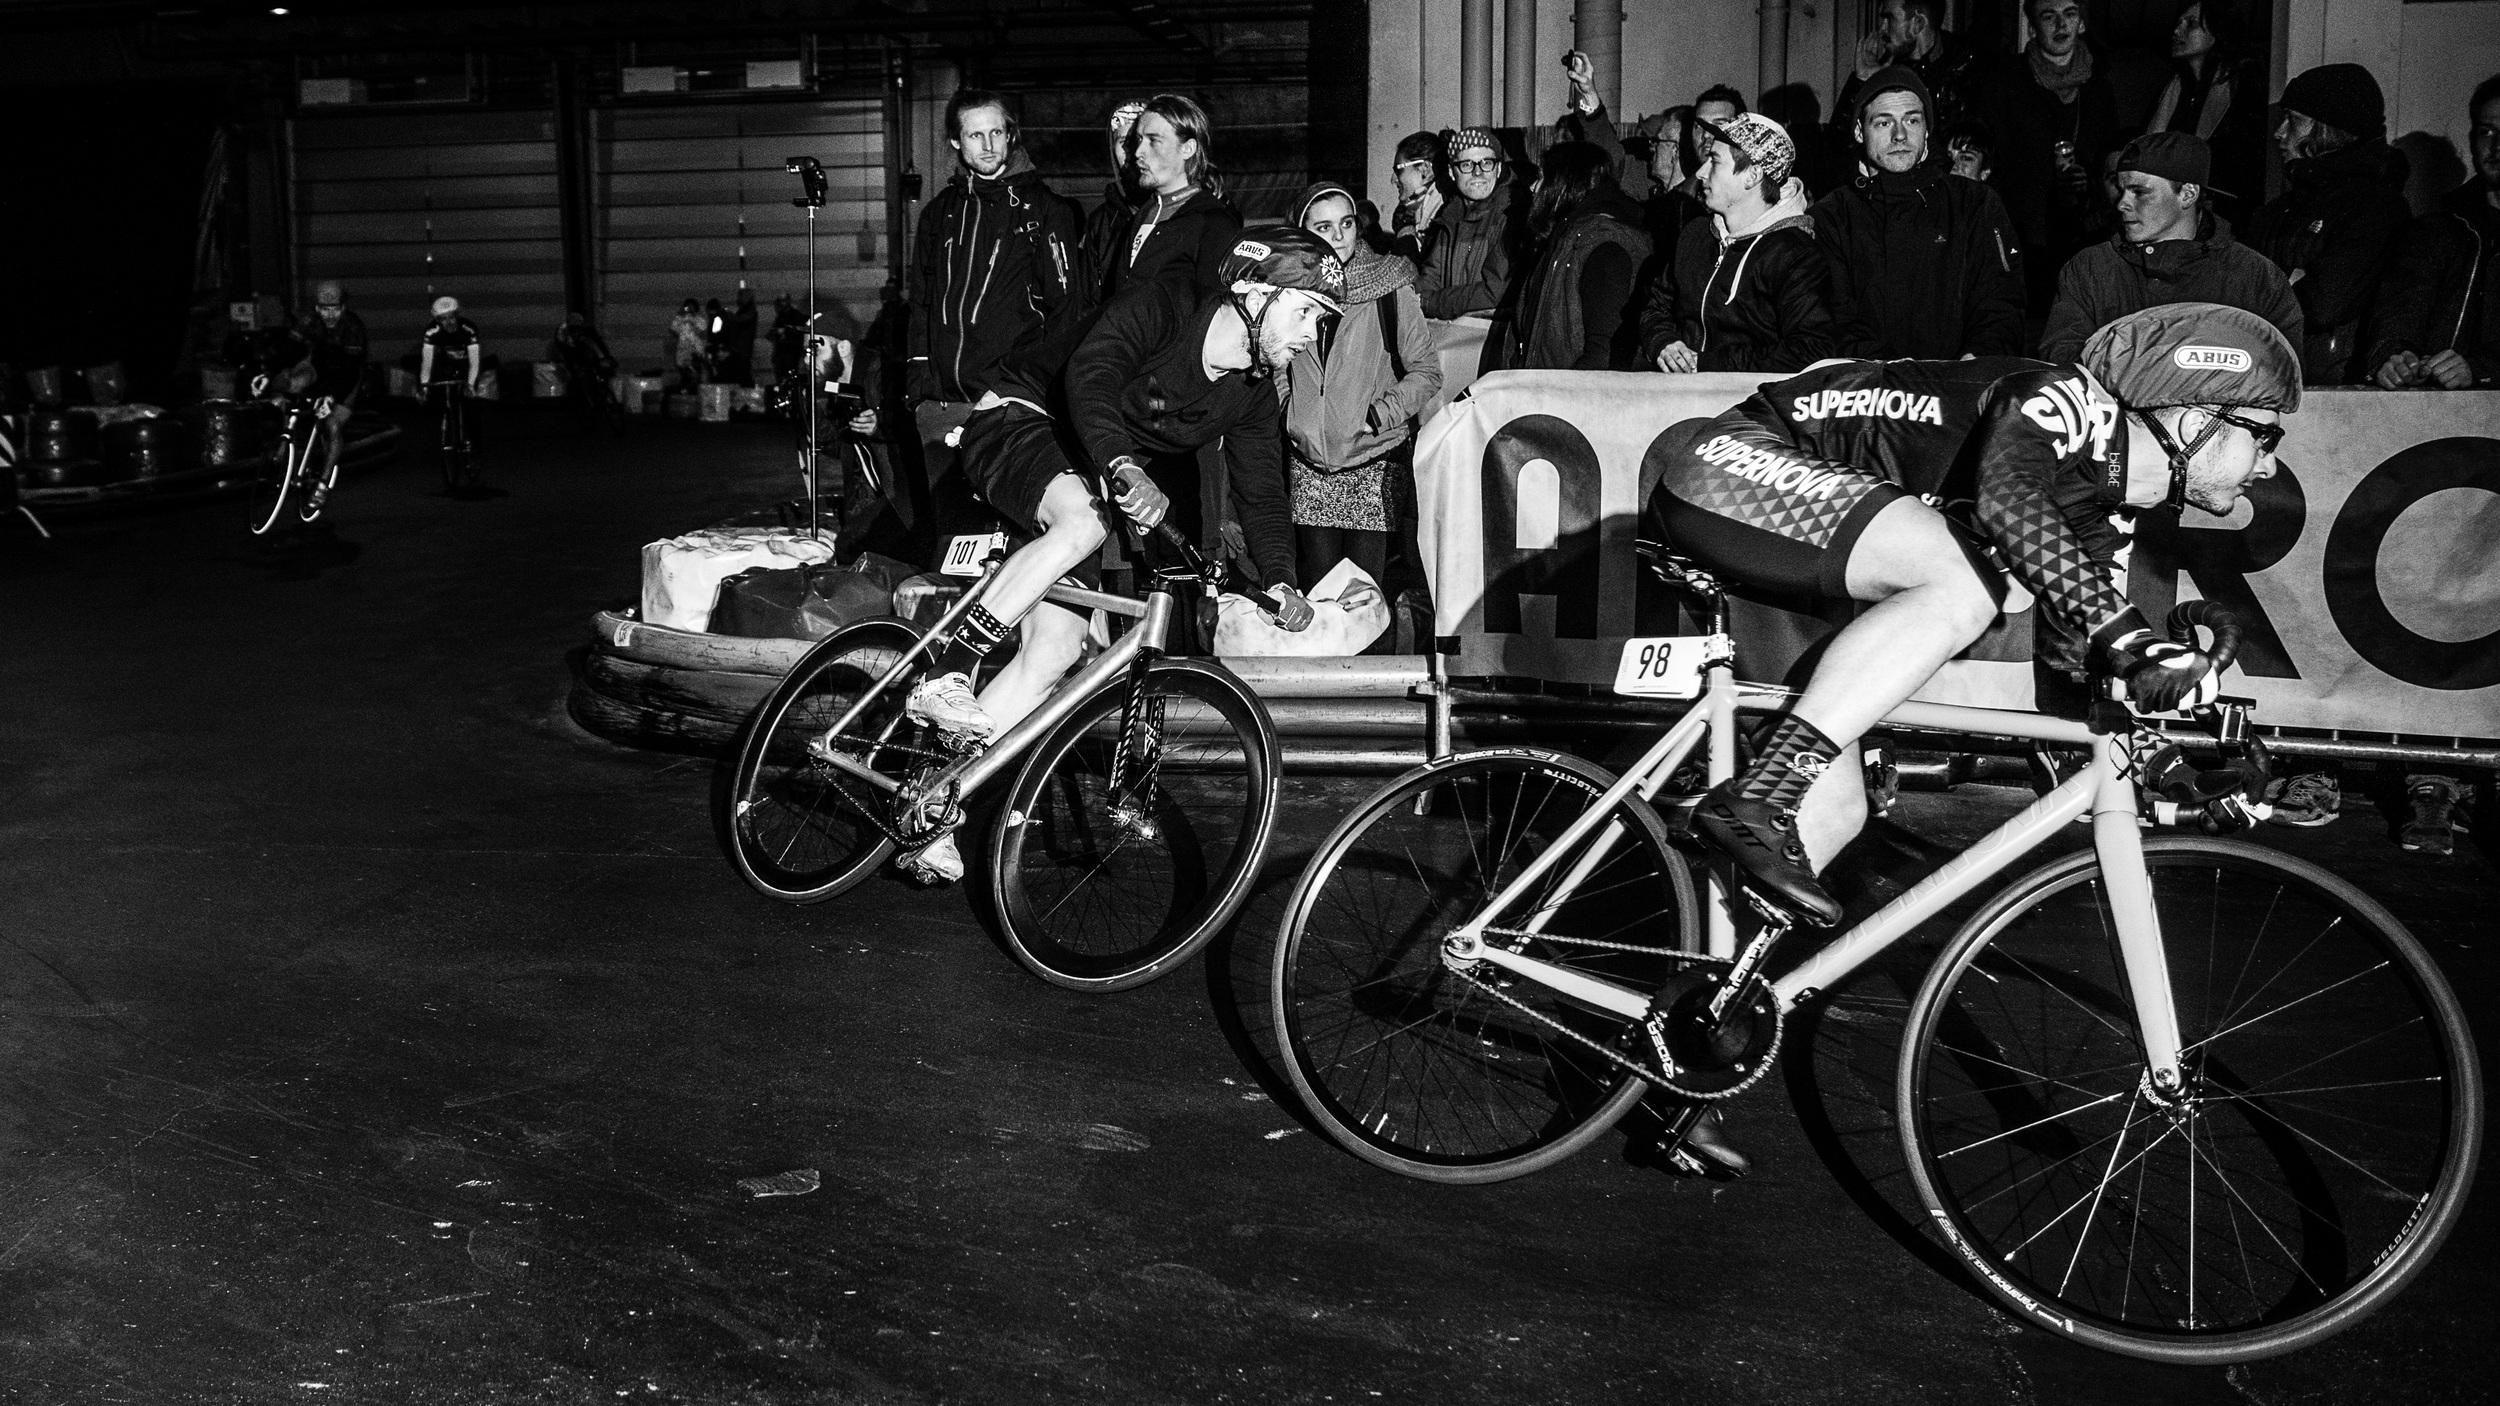 RAD RACE Last Man Standing, Berlin March 19 2016 - Shot by Drew Kaplan 44.jpg